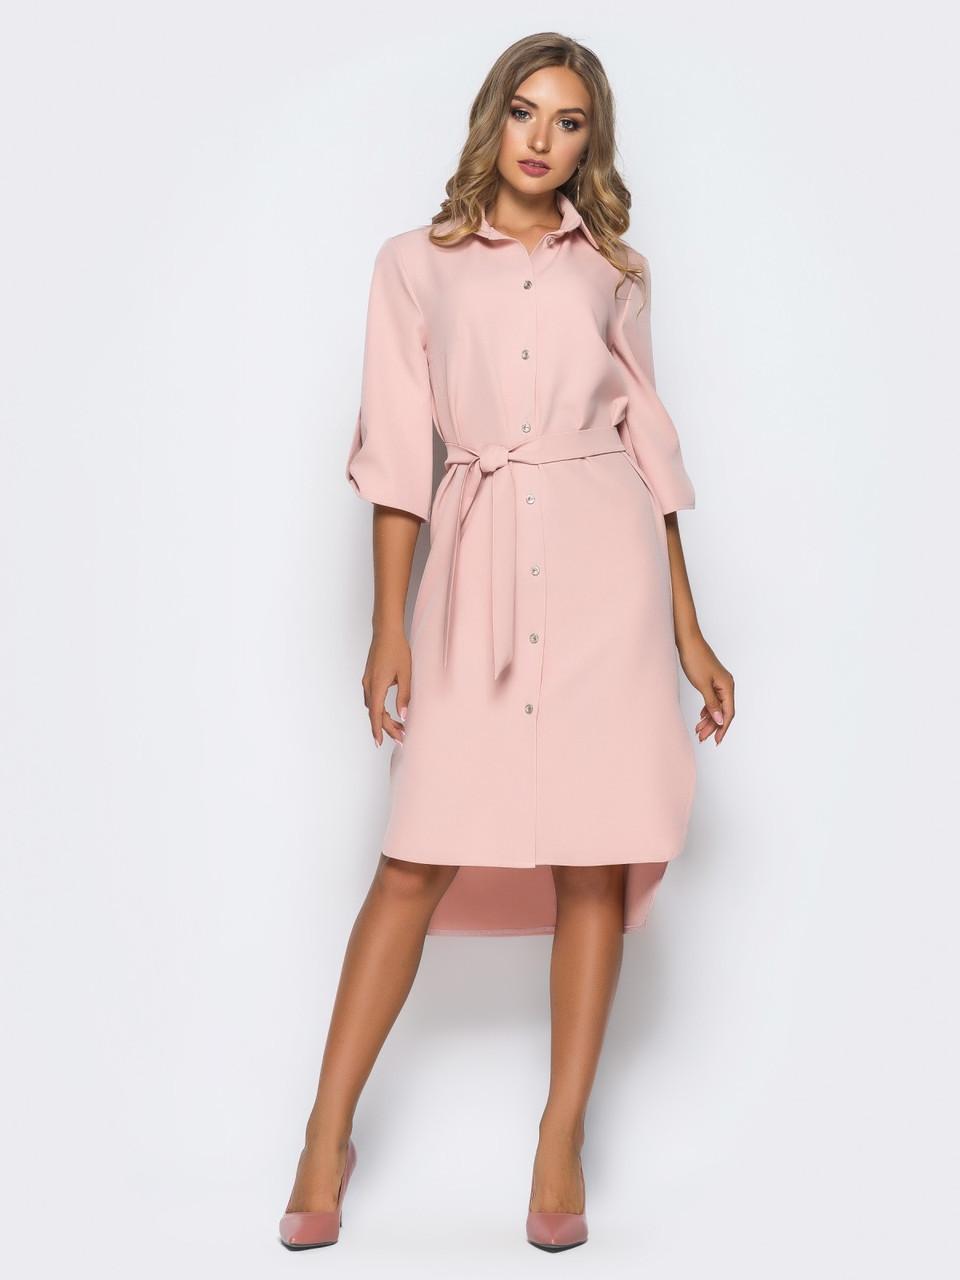 d55bd5b0d92 💎Розовое платье-рубашка   Размер 44